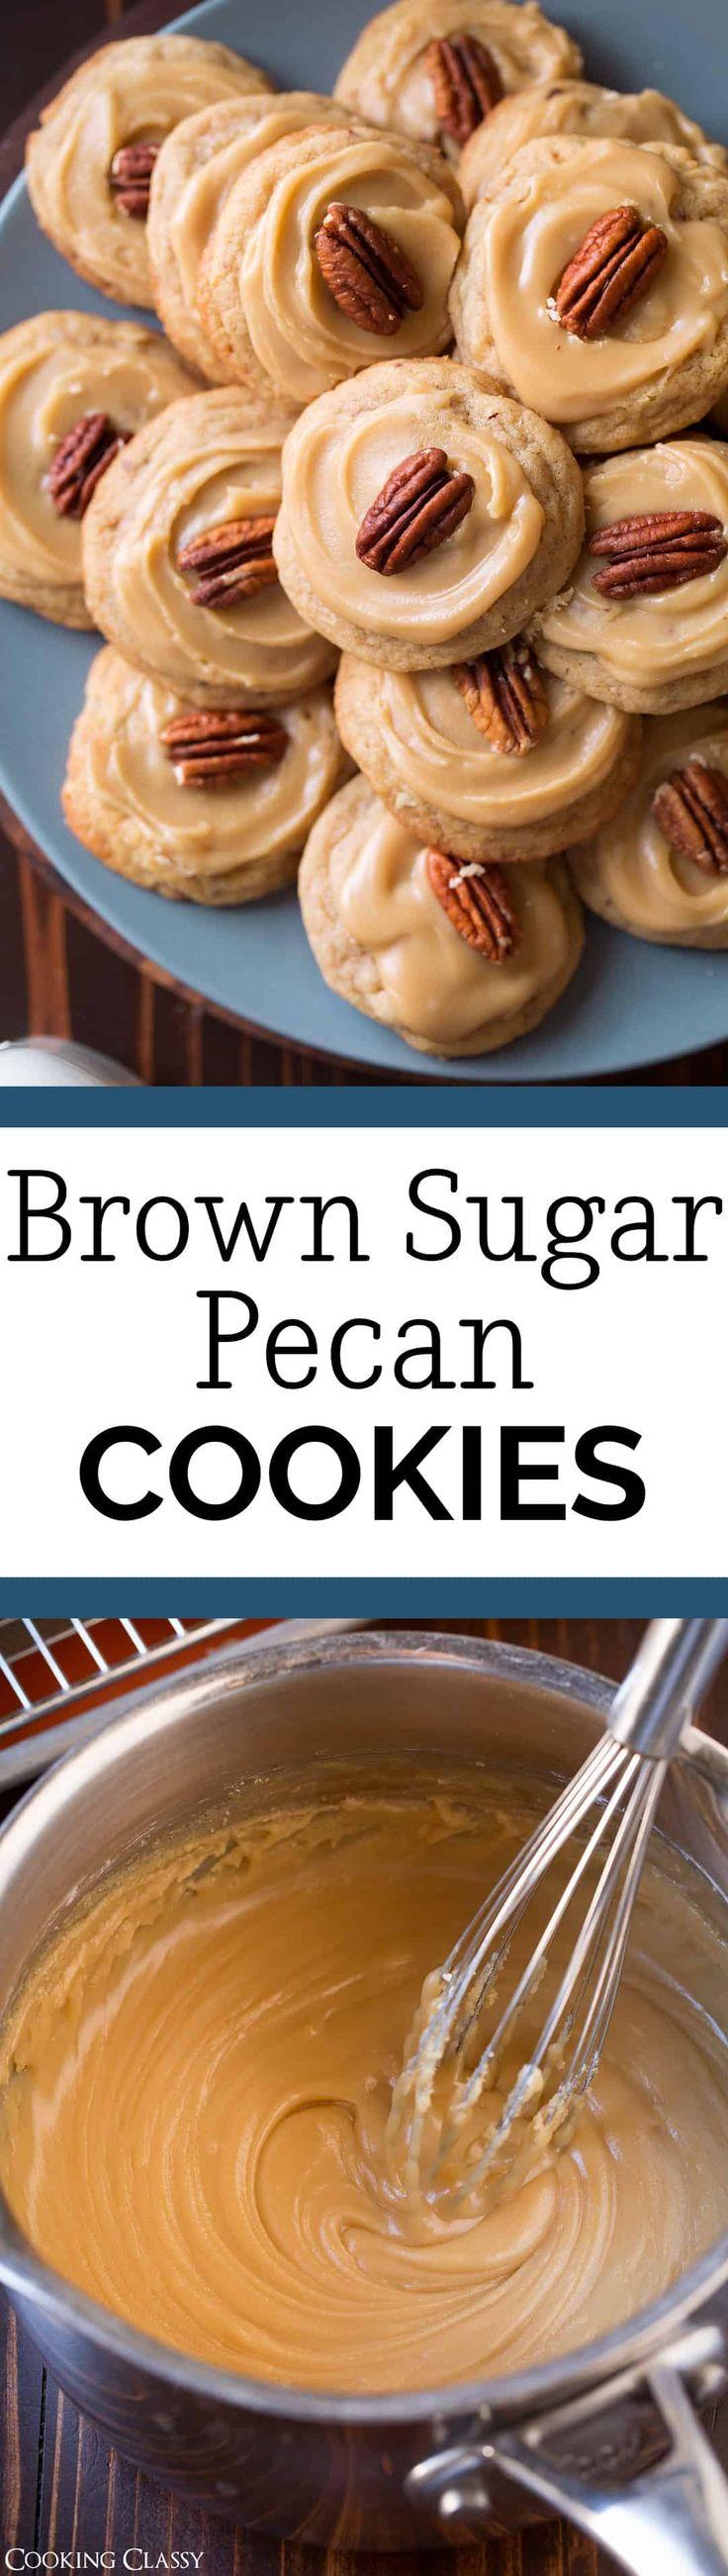 pecan cookies  | Posted By: DebbieNet.com